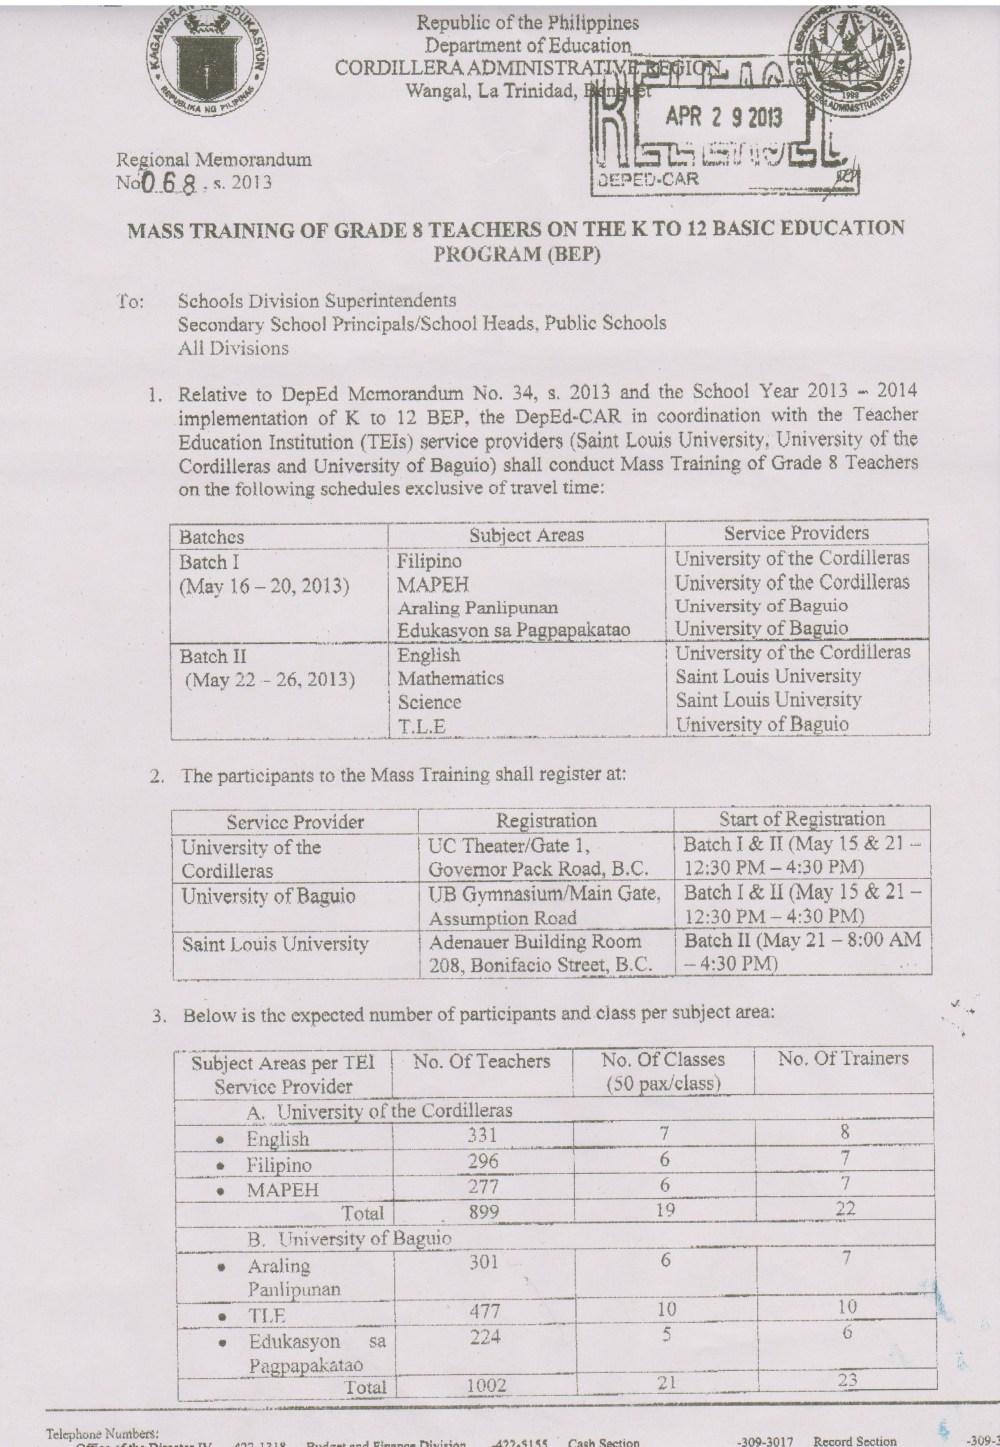 medium resolution of Regional Memo No. 68 S. 2013 Mass Training of Grade 8 Teachers on the K to  12 Basic Education Program (BEP)